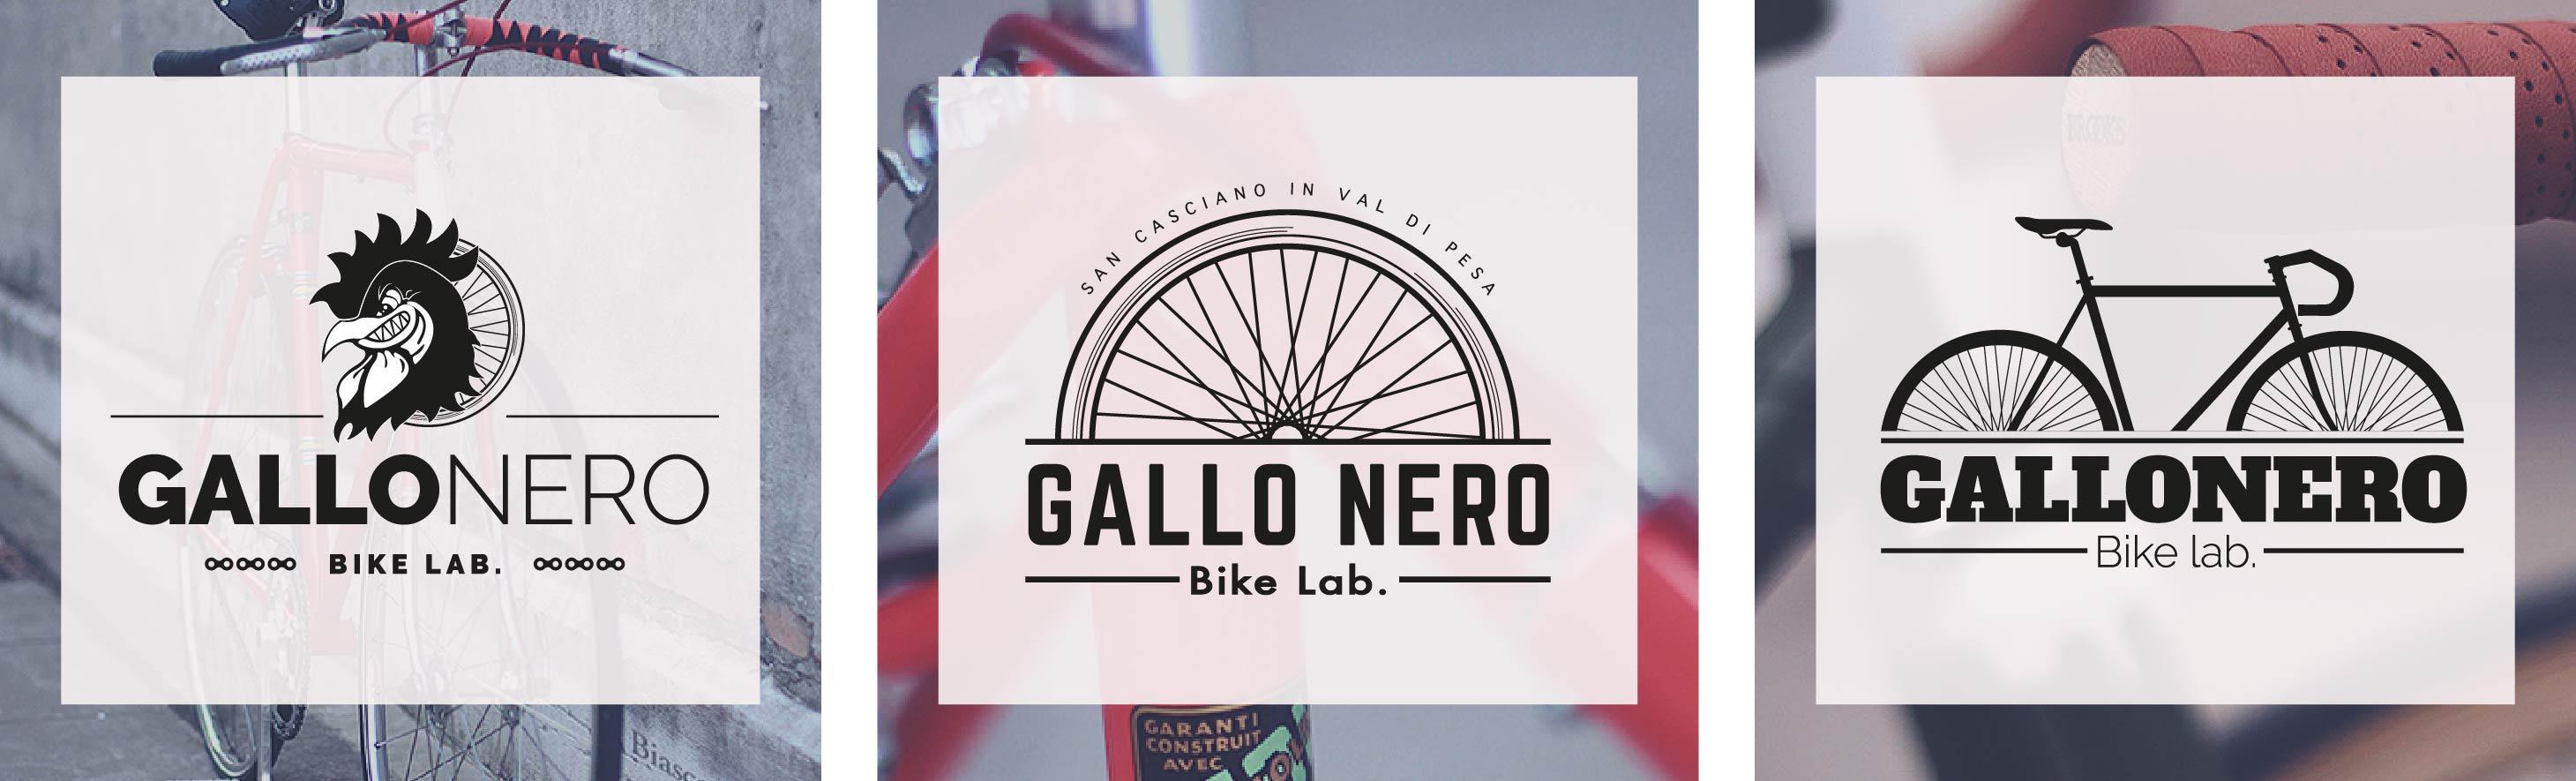 mockup-logo-gallonerobikelab-altre-proposte-01